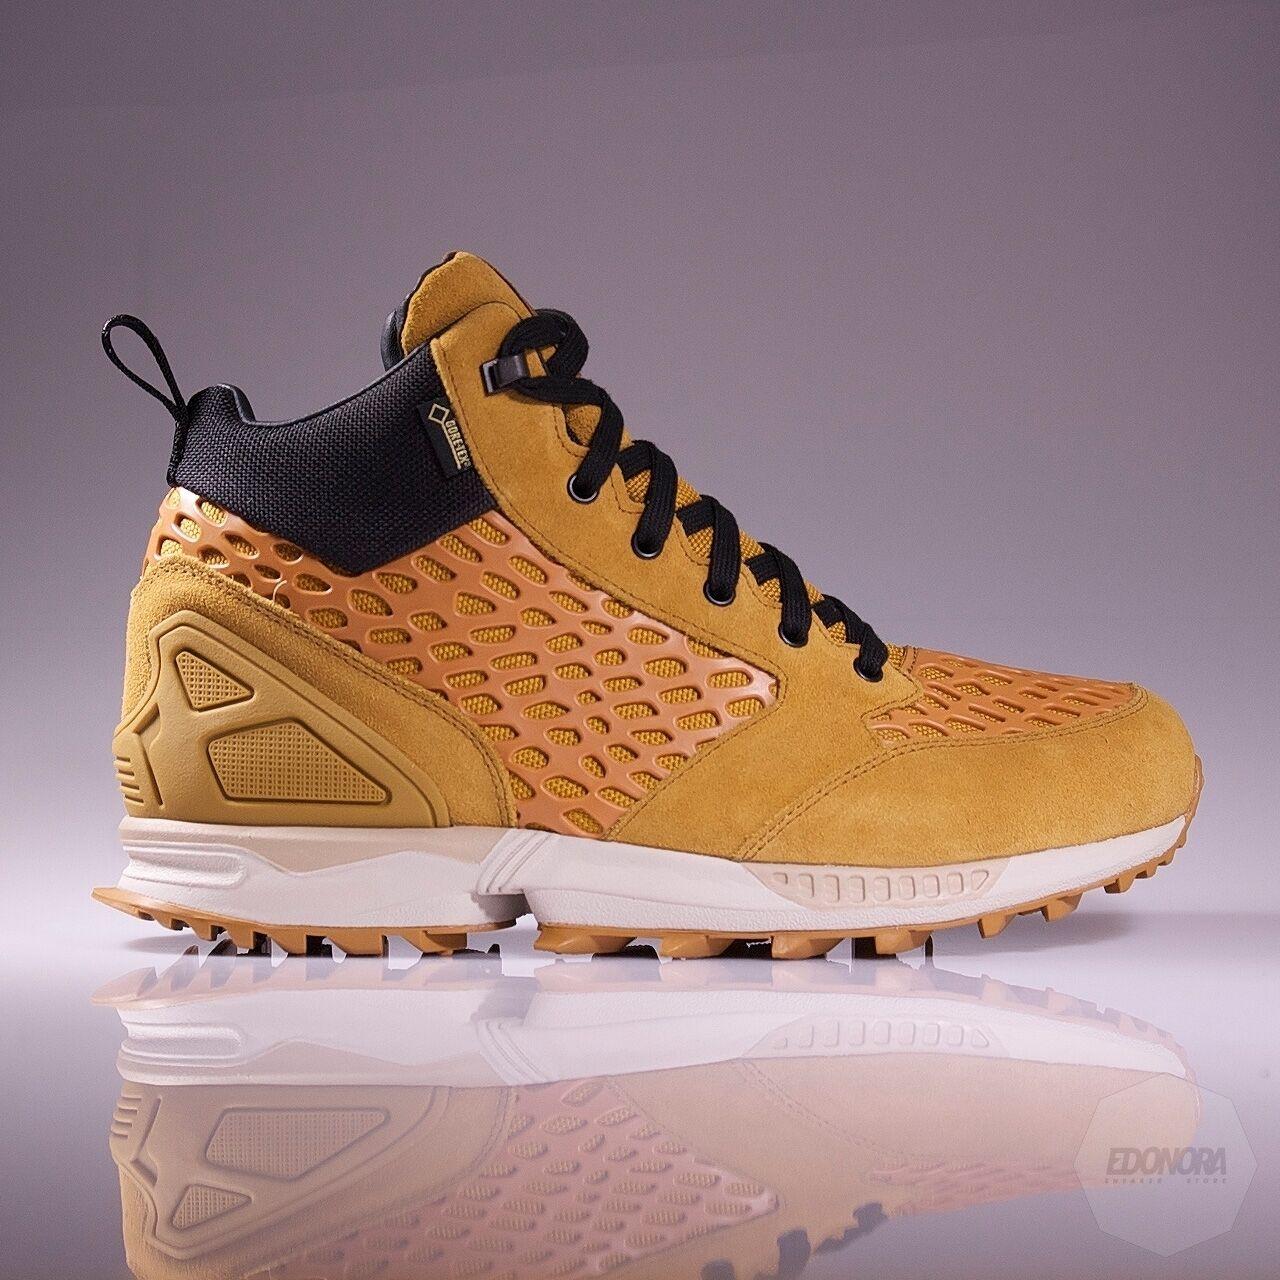 Adidas zx gore - tex tac torsion schild gtx trail - wandern torsion tac schuh terrex - männer sz - 8 20a1ae